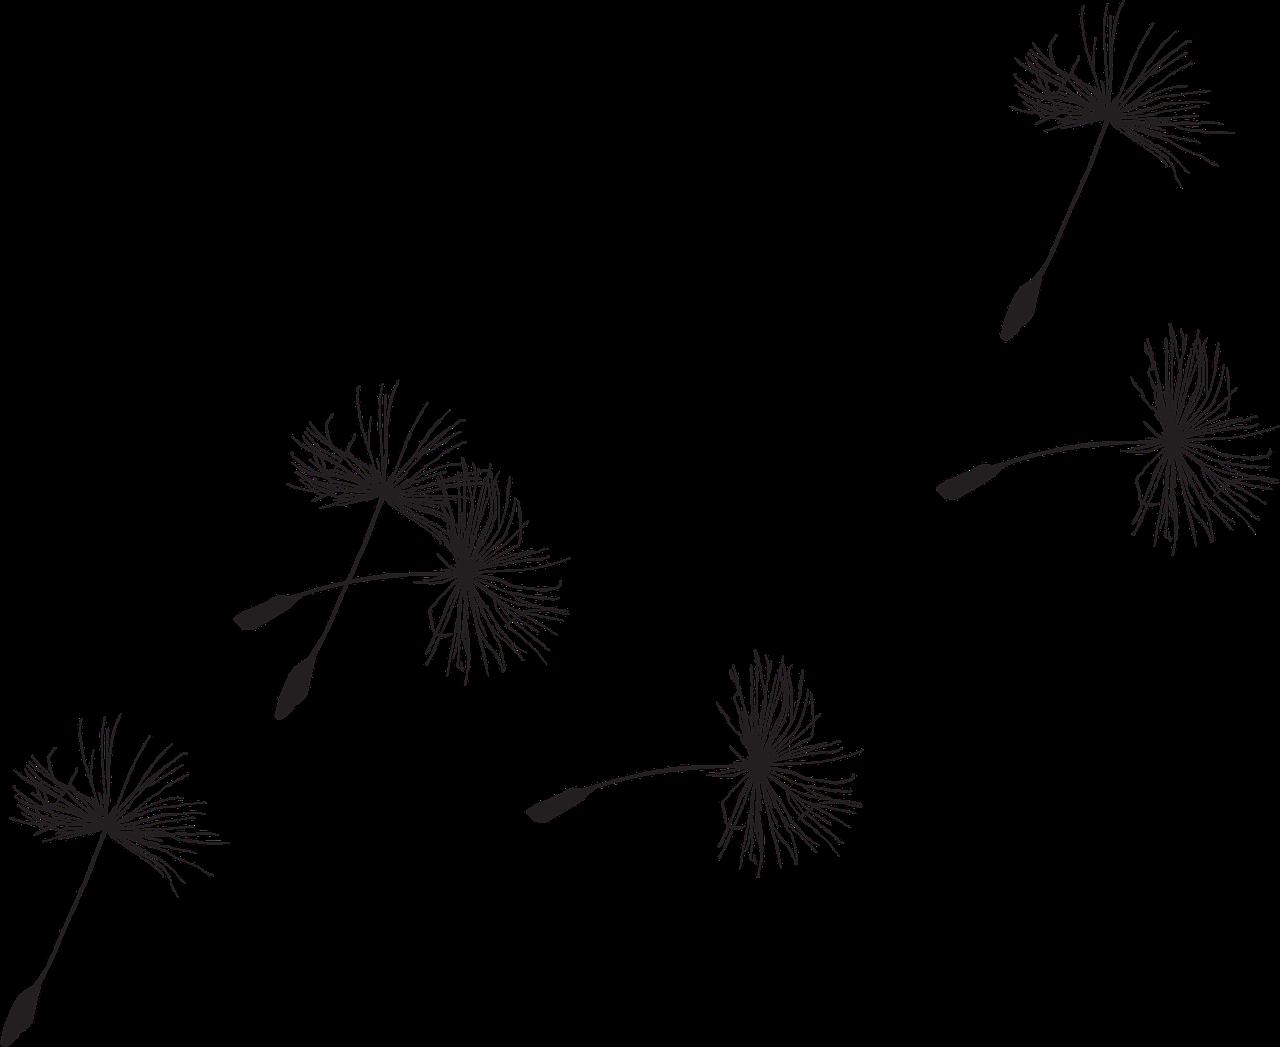 Drawn dandelion Or pixels